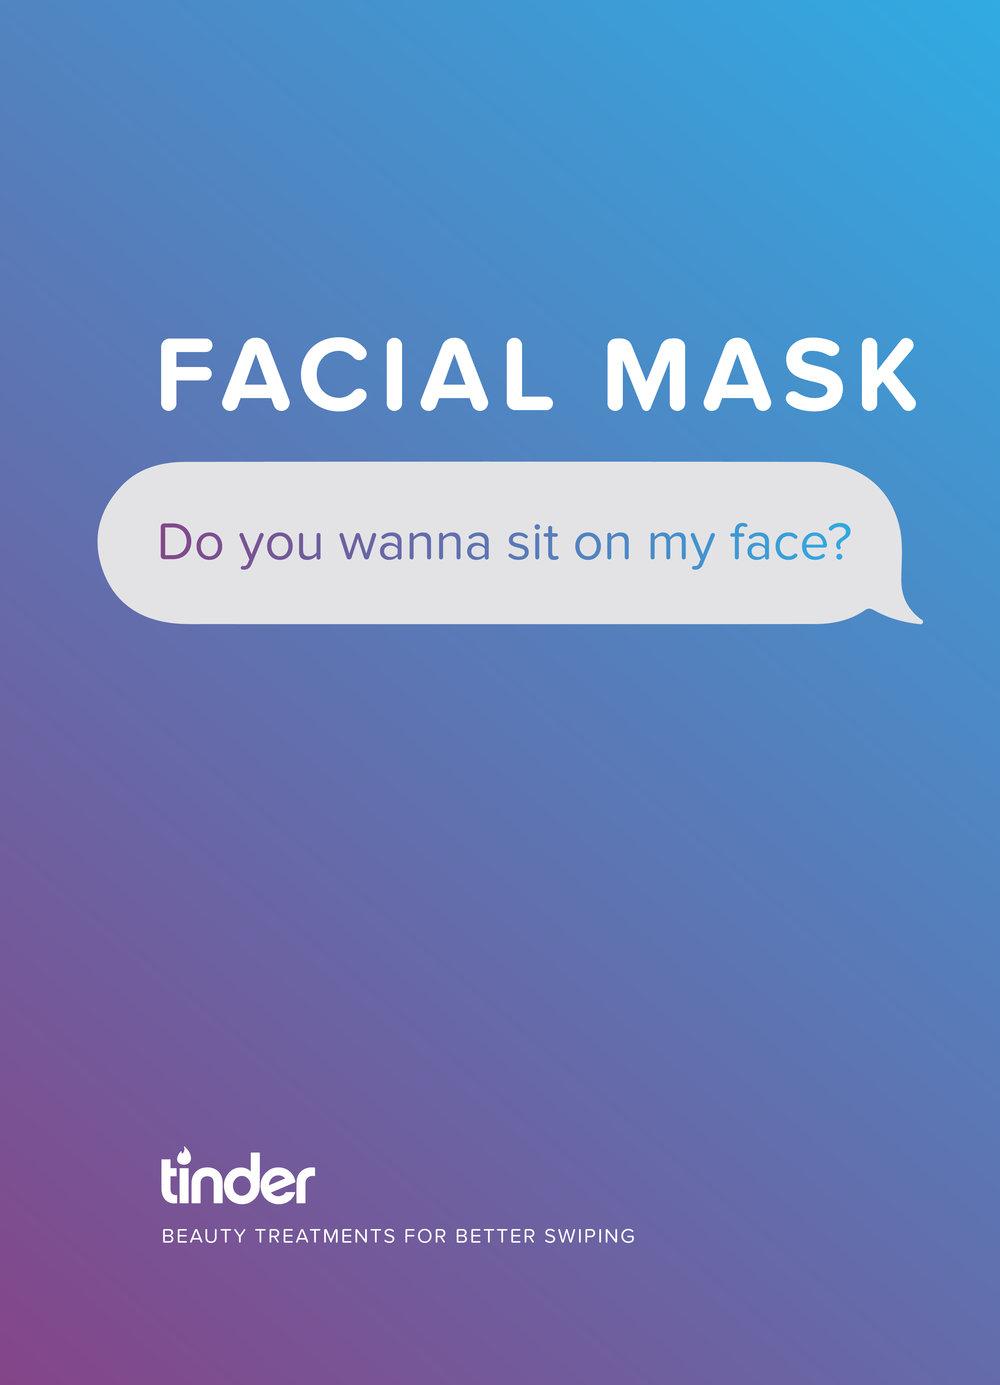 Face Masks3.jpg